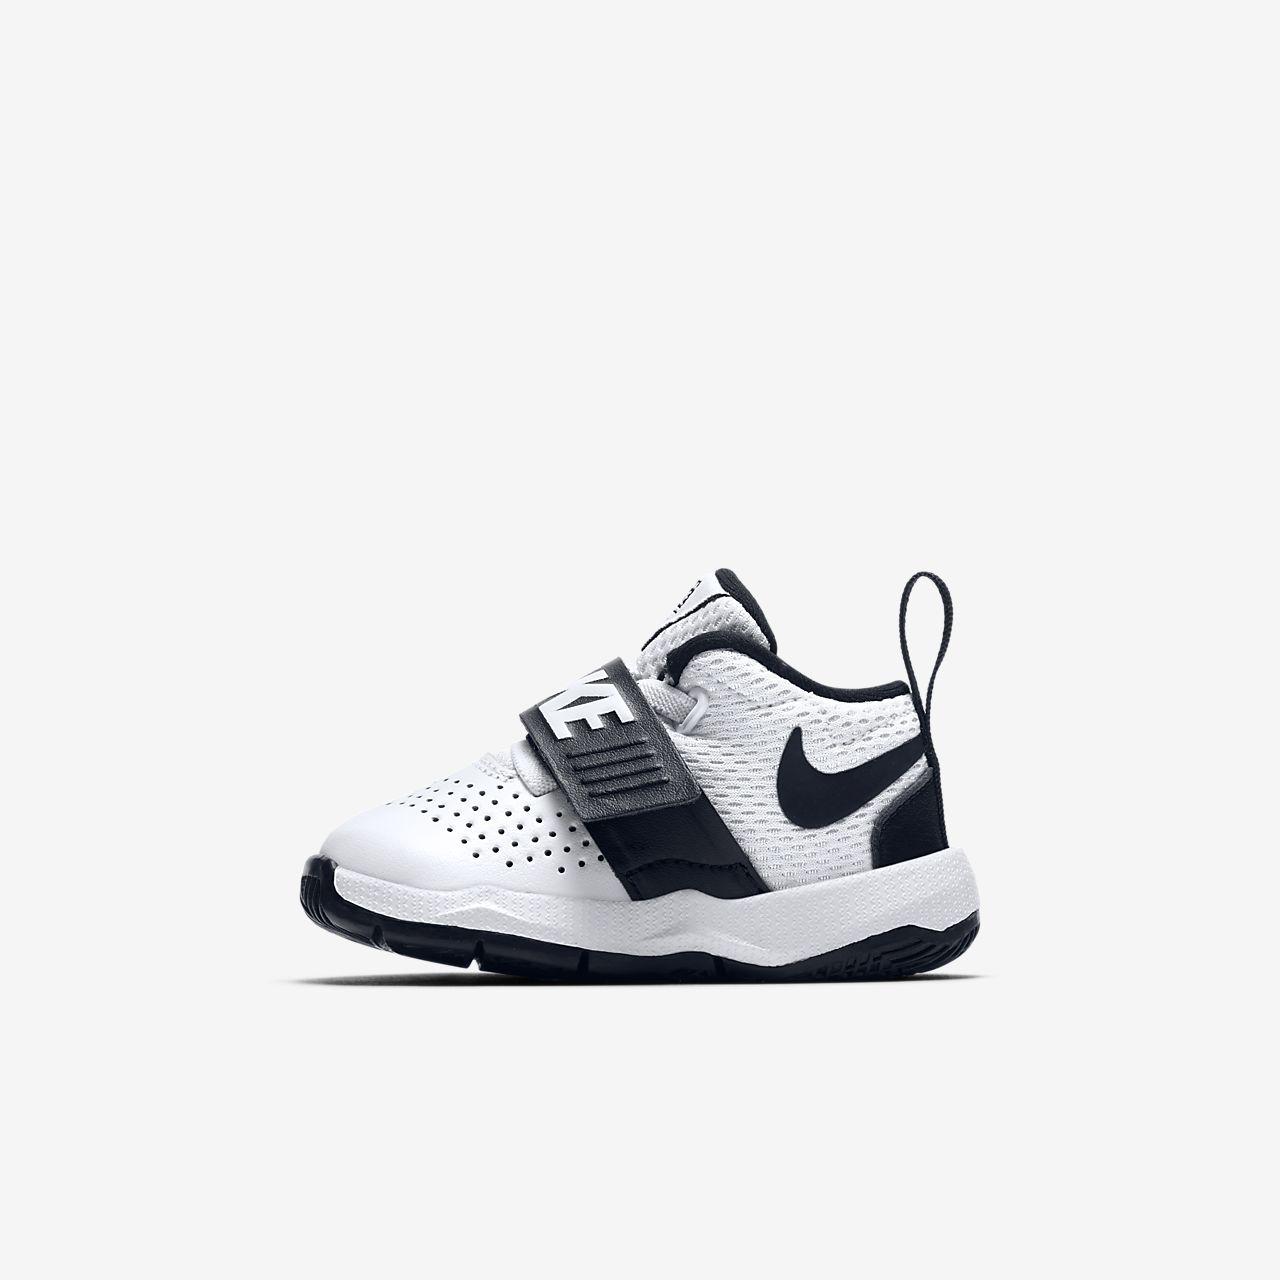 Nike Team Hustle D 8 (881943-100) Boy Basketball Shoes Black/White